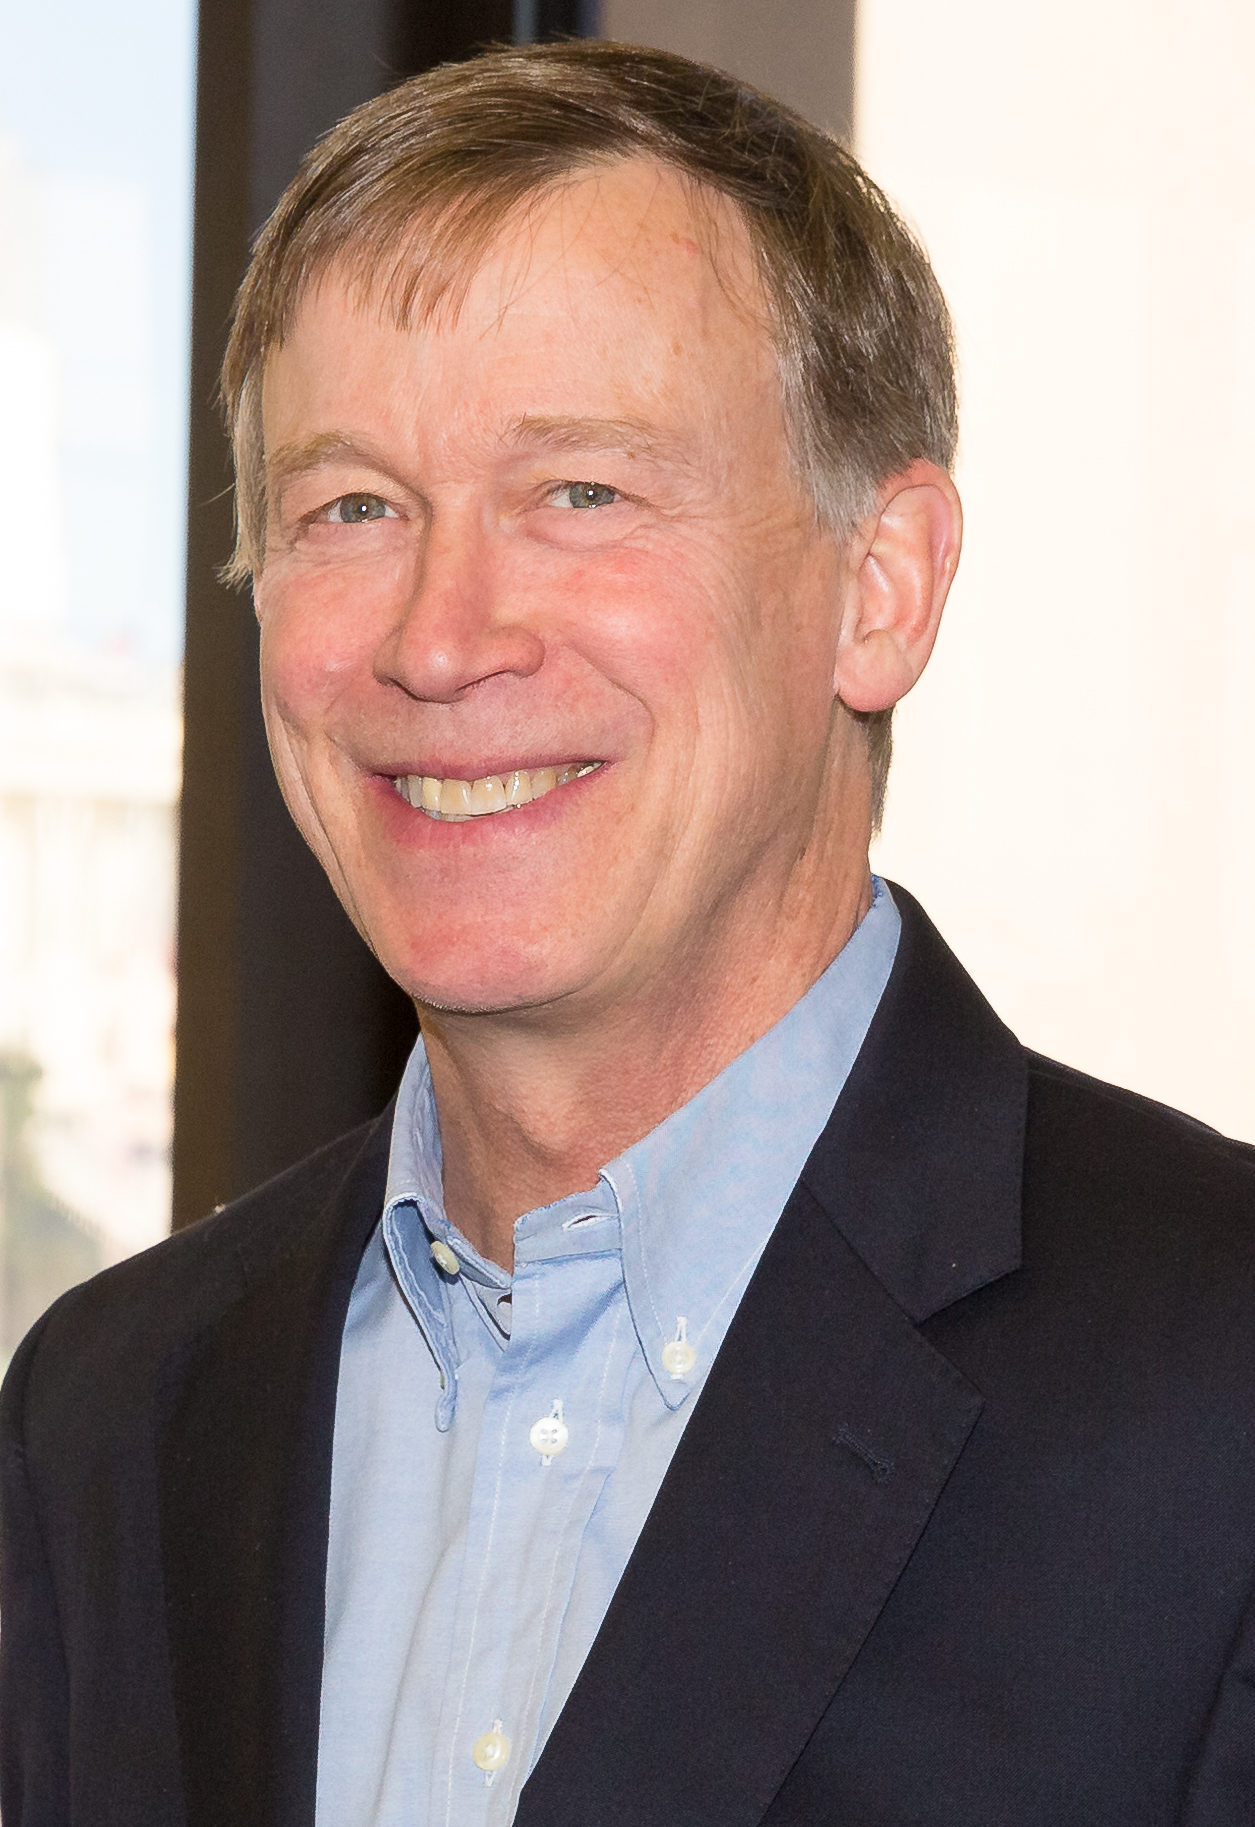 John Hickenlooper (D)